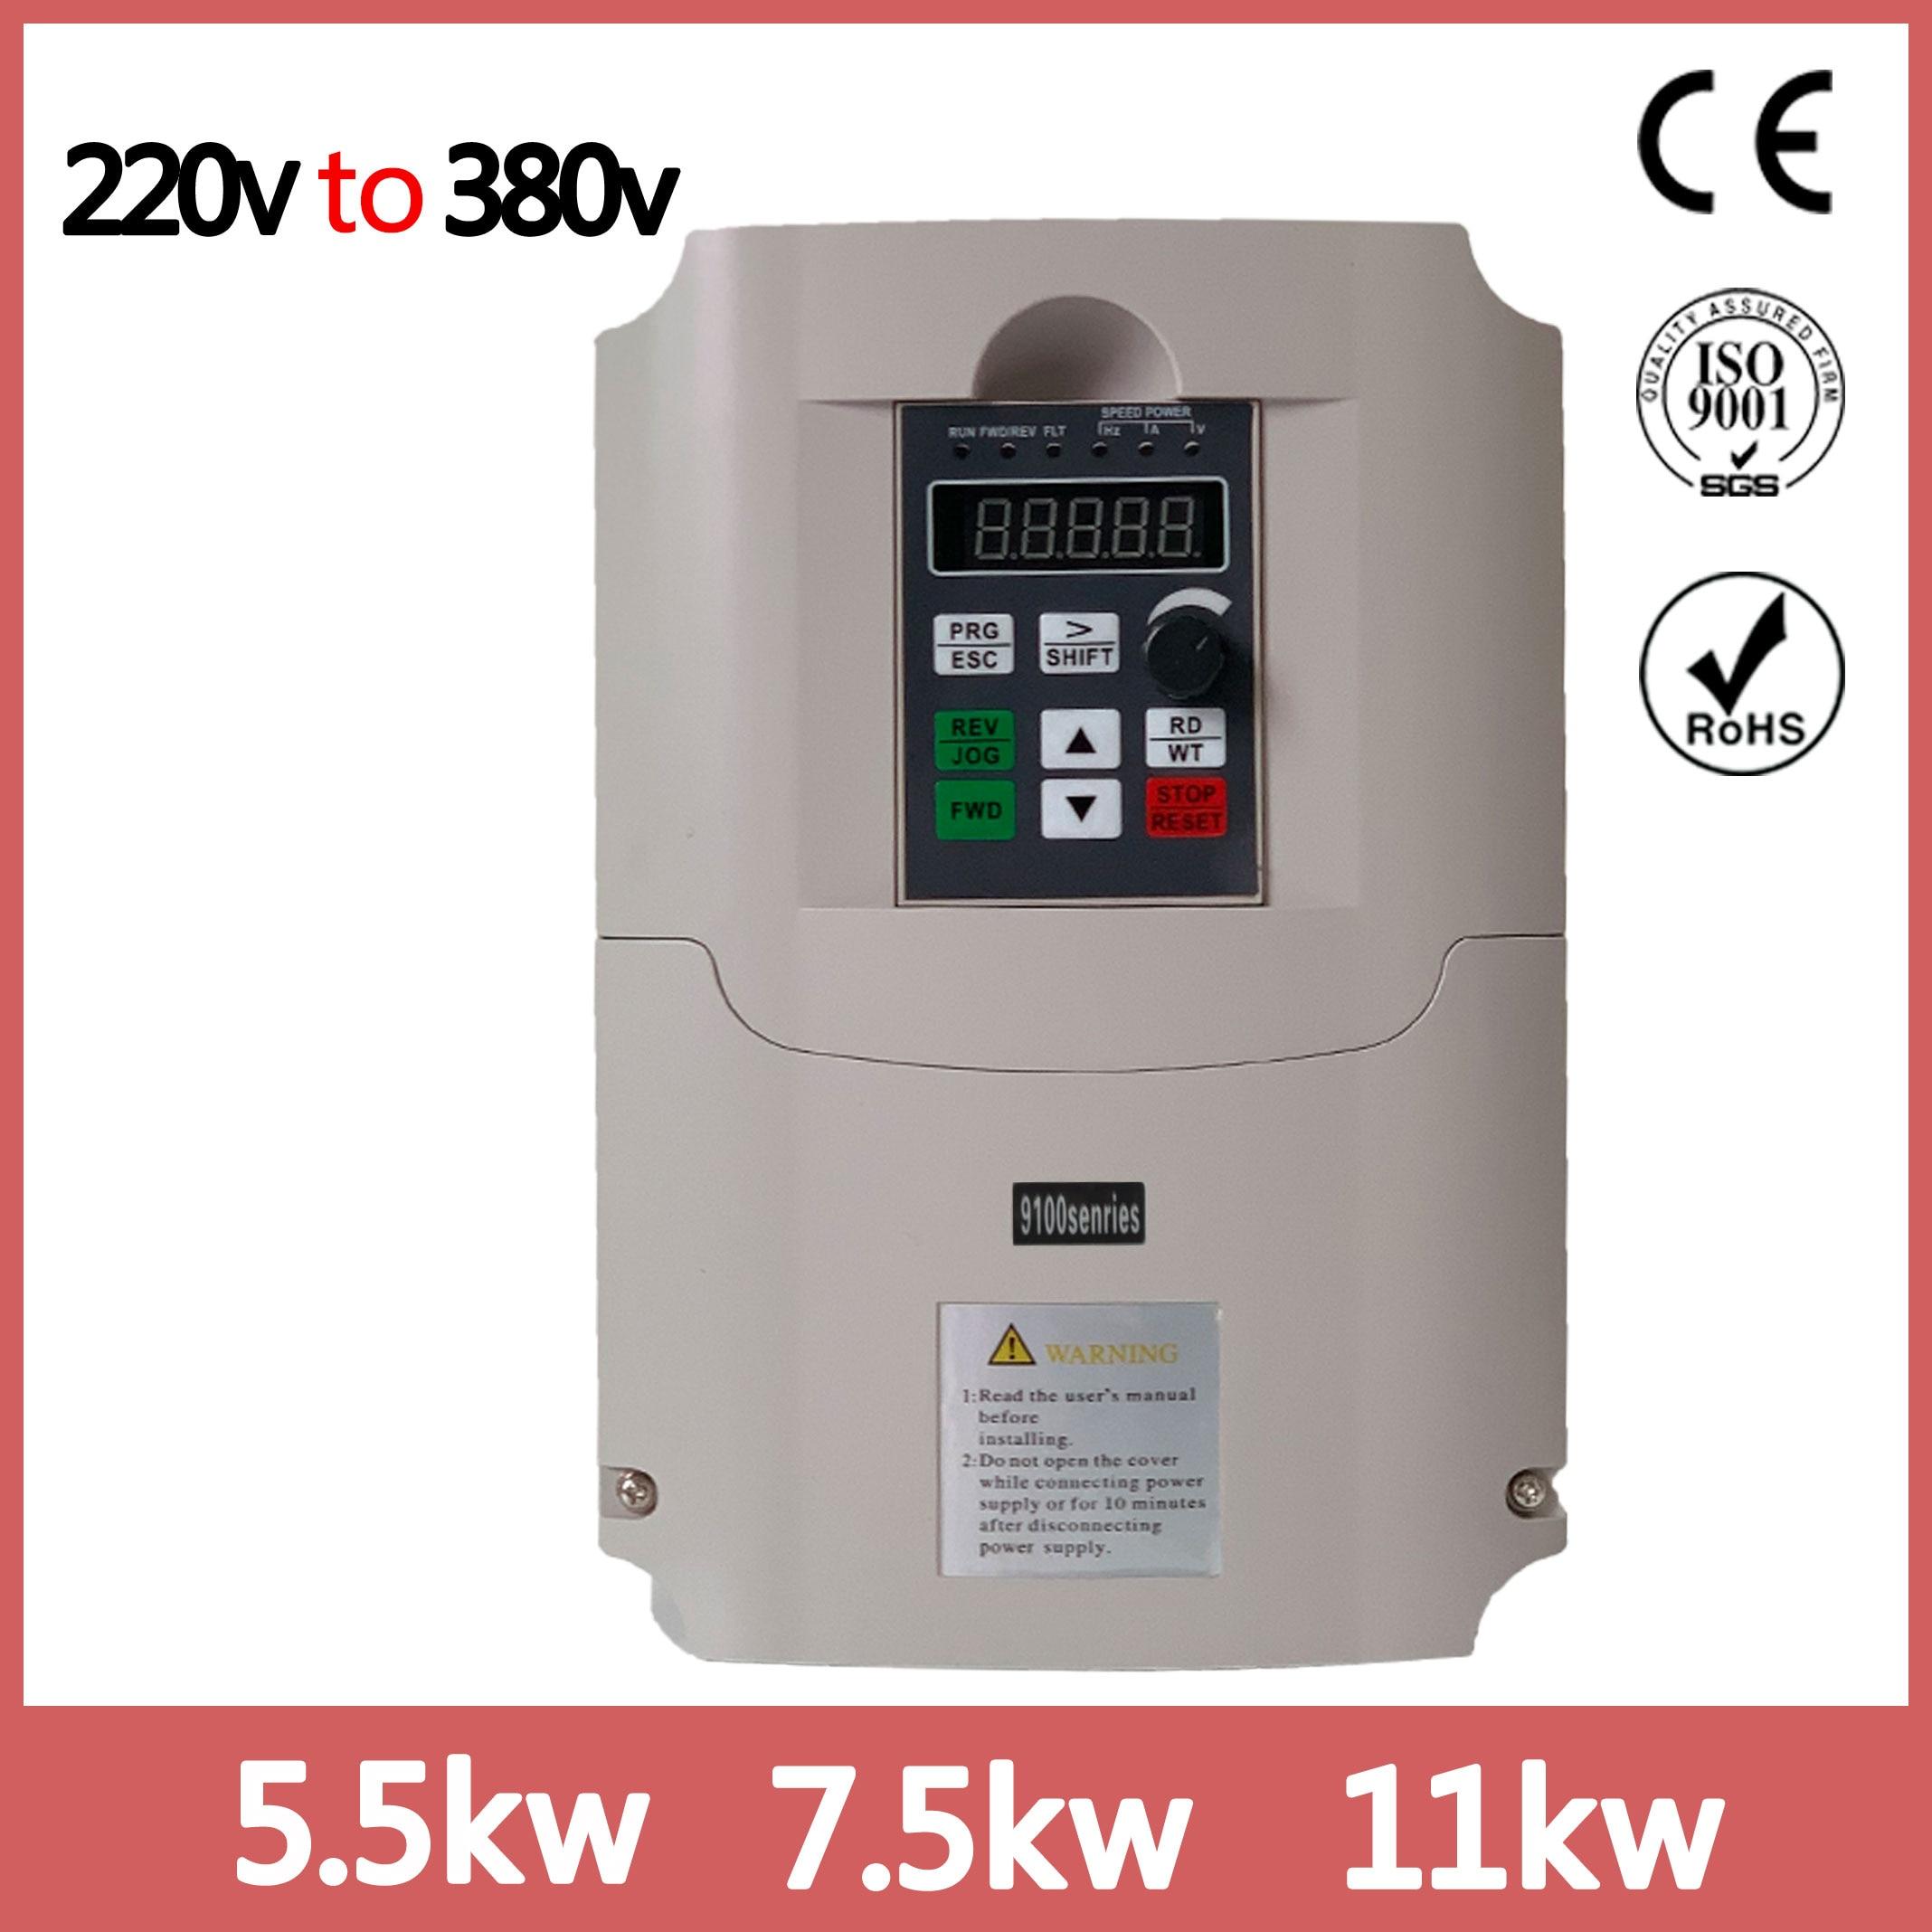 5 5kw 7 inversor de frequencia ca 5kw 11kw 220v entrada monofasica 380v saida 3 fase